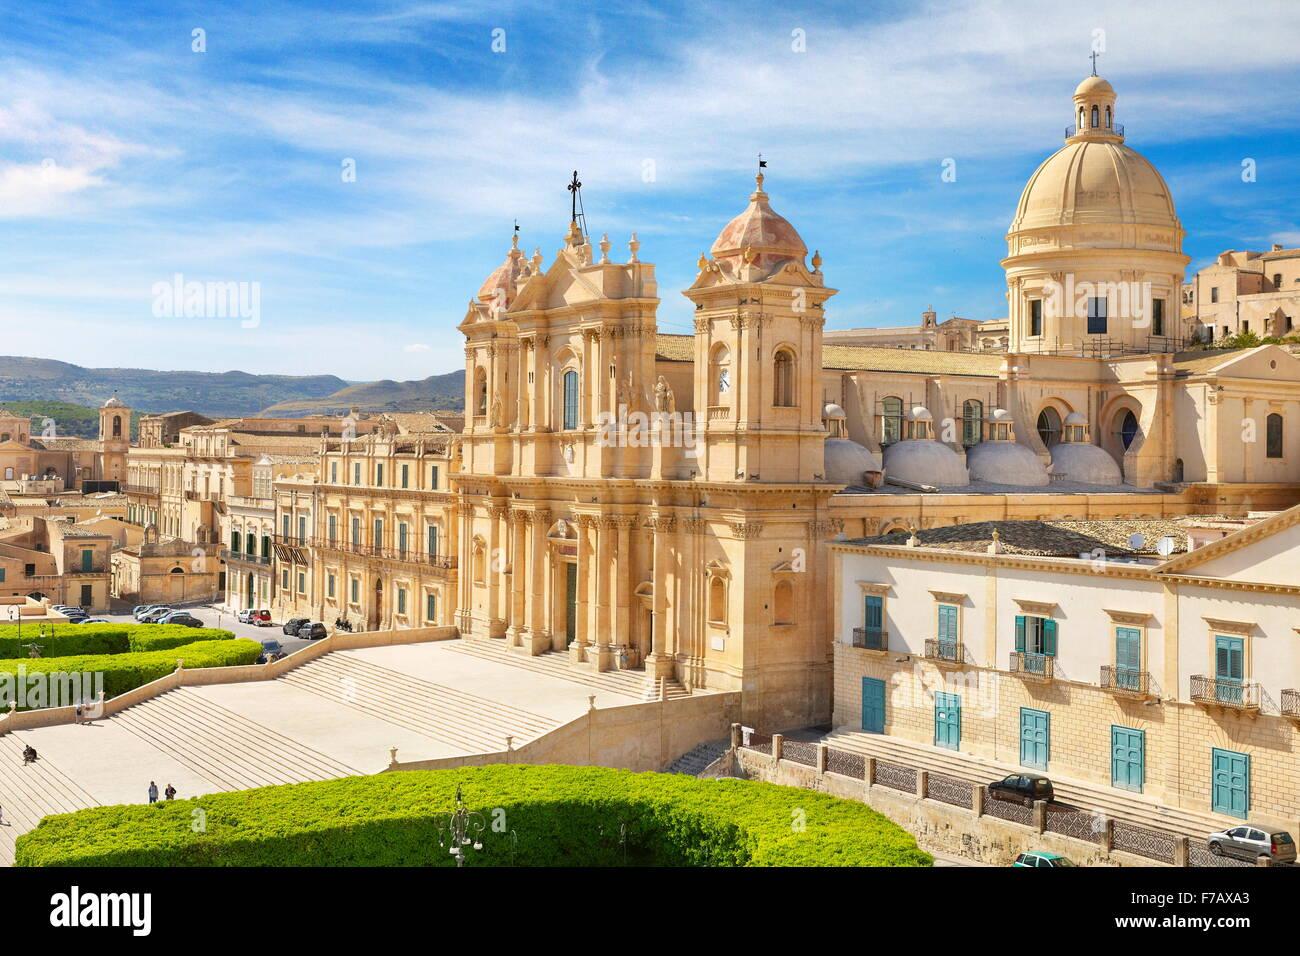 Noto baroque de San Nicolo, vieille ville de Noto, en Sicile, Italie l'UNESCO Photo Stock